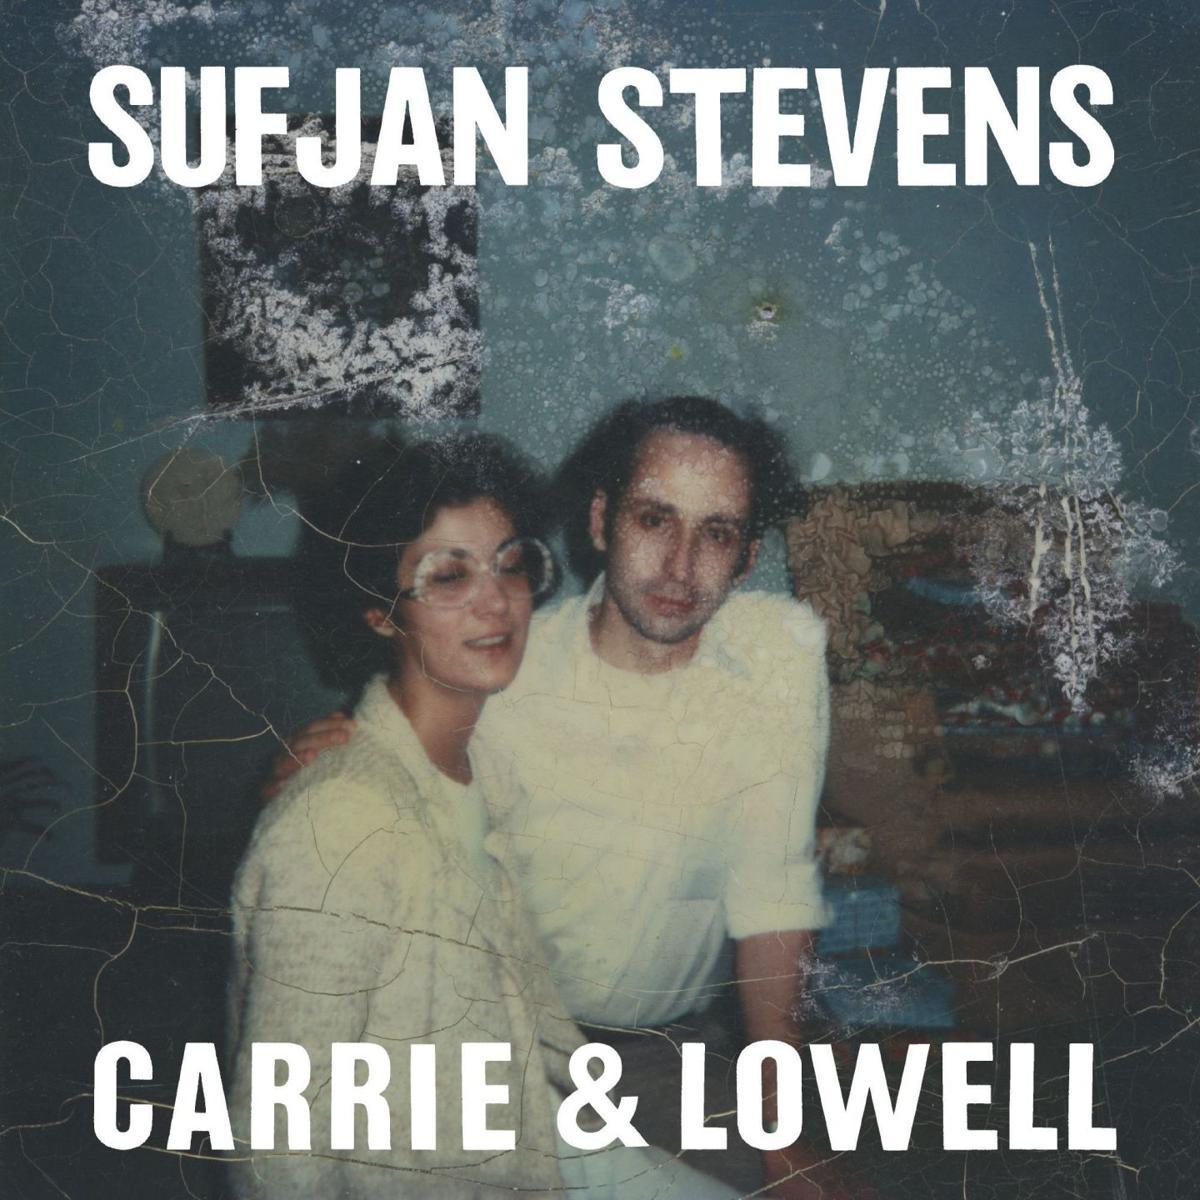 Sufjan Stevens, 'Carrie & Lowell,' Asthmatic Kitty